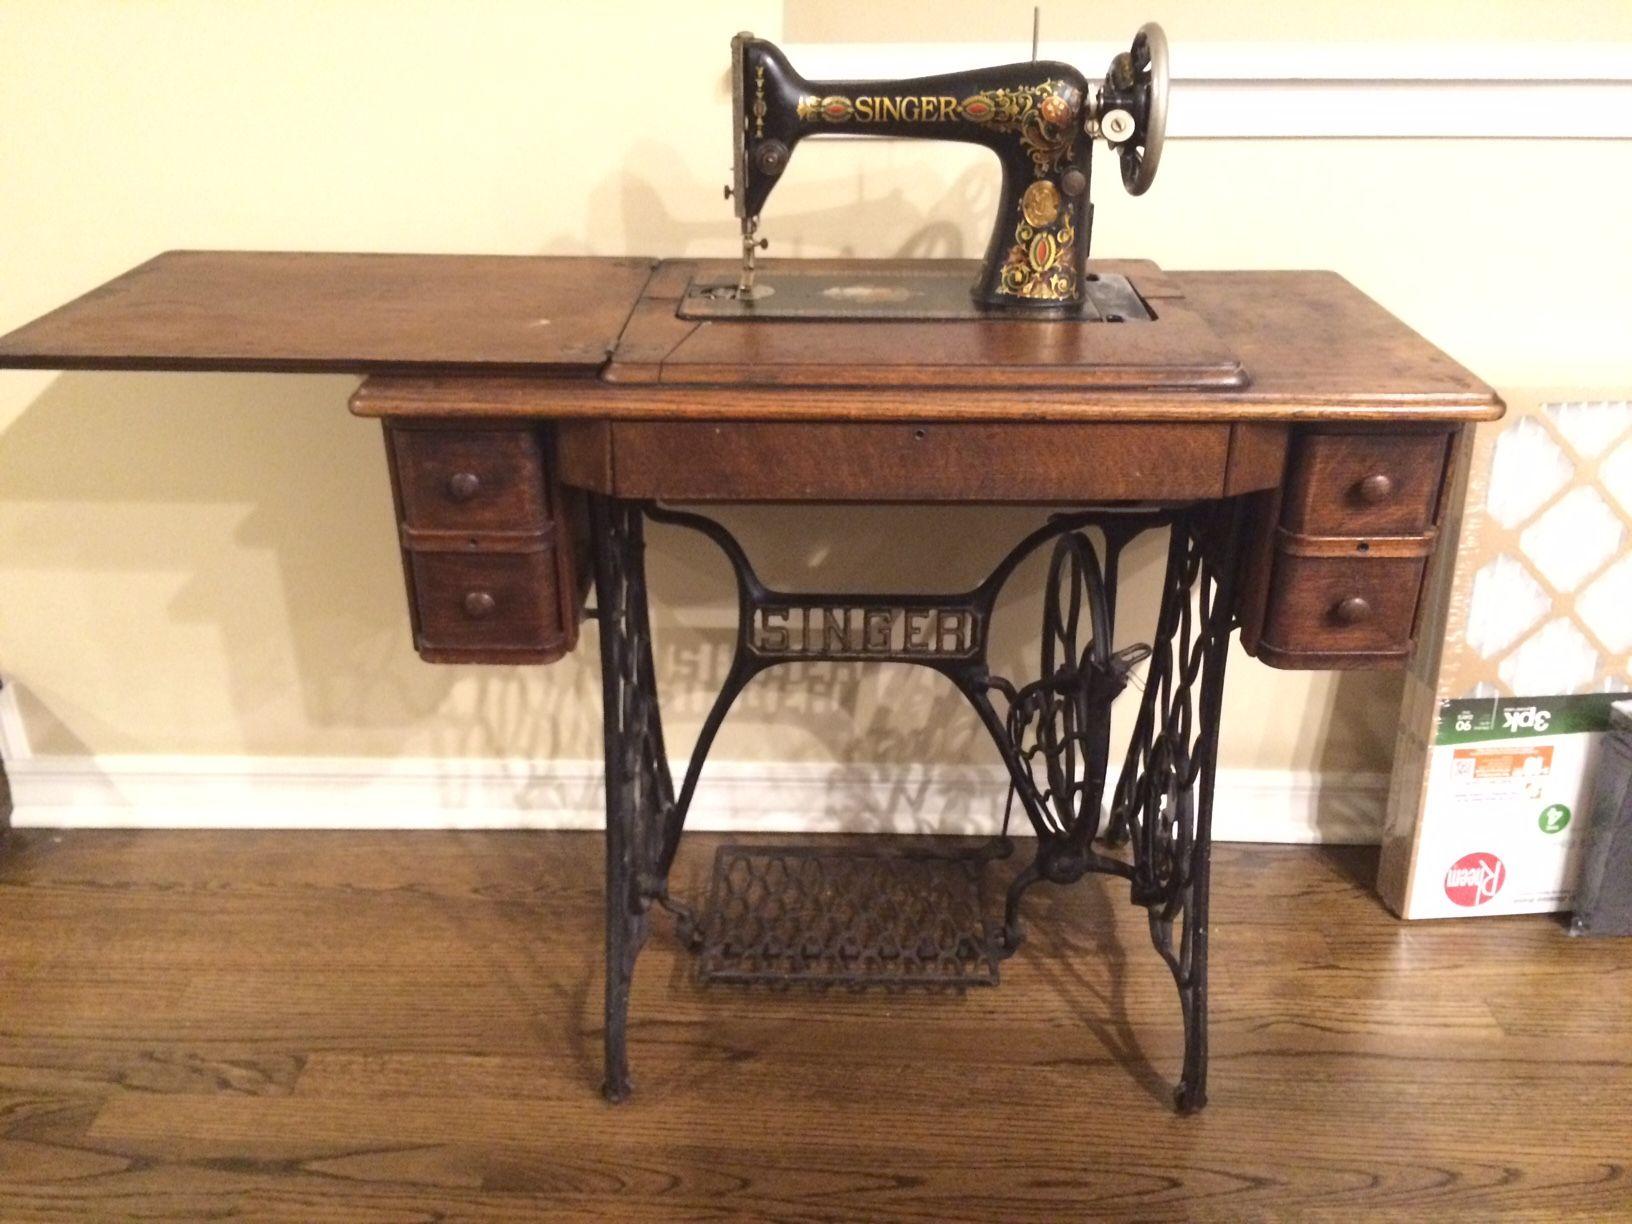 Vintage Singer Sewing Machine Table Craigslist Dining Room